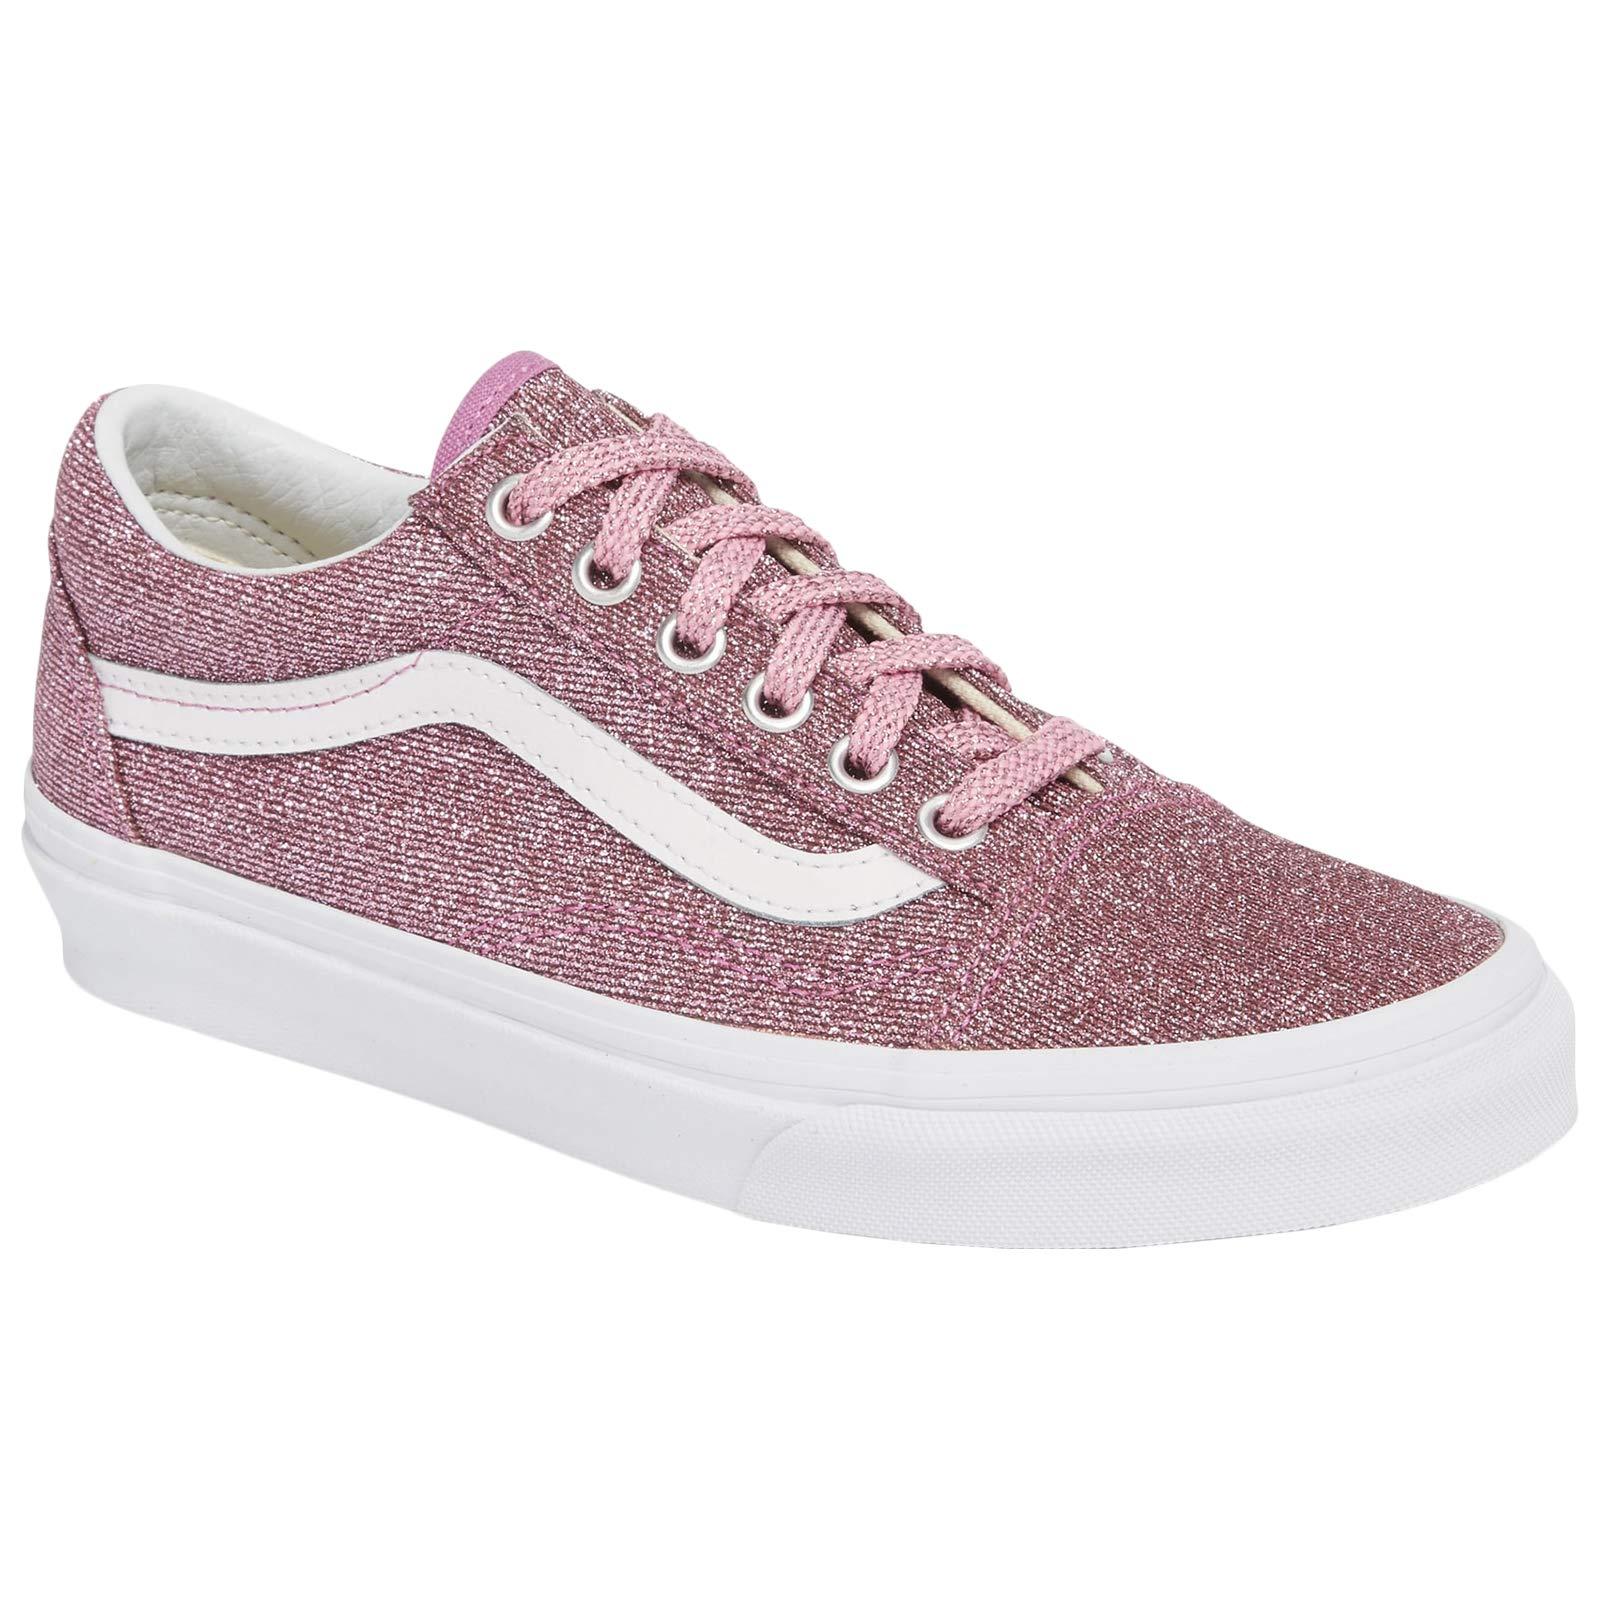 1017750d404 Galleon - Vans Unisex Old Skool Textile Pink True Trainers 9 W   7.5 ...